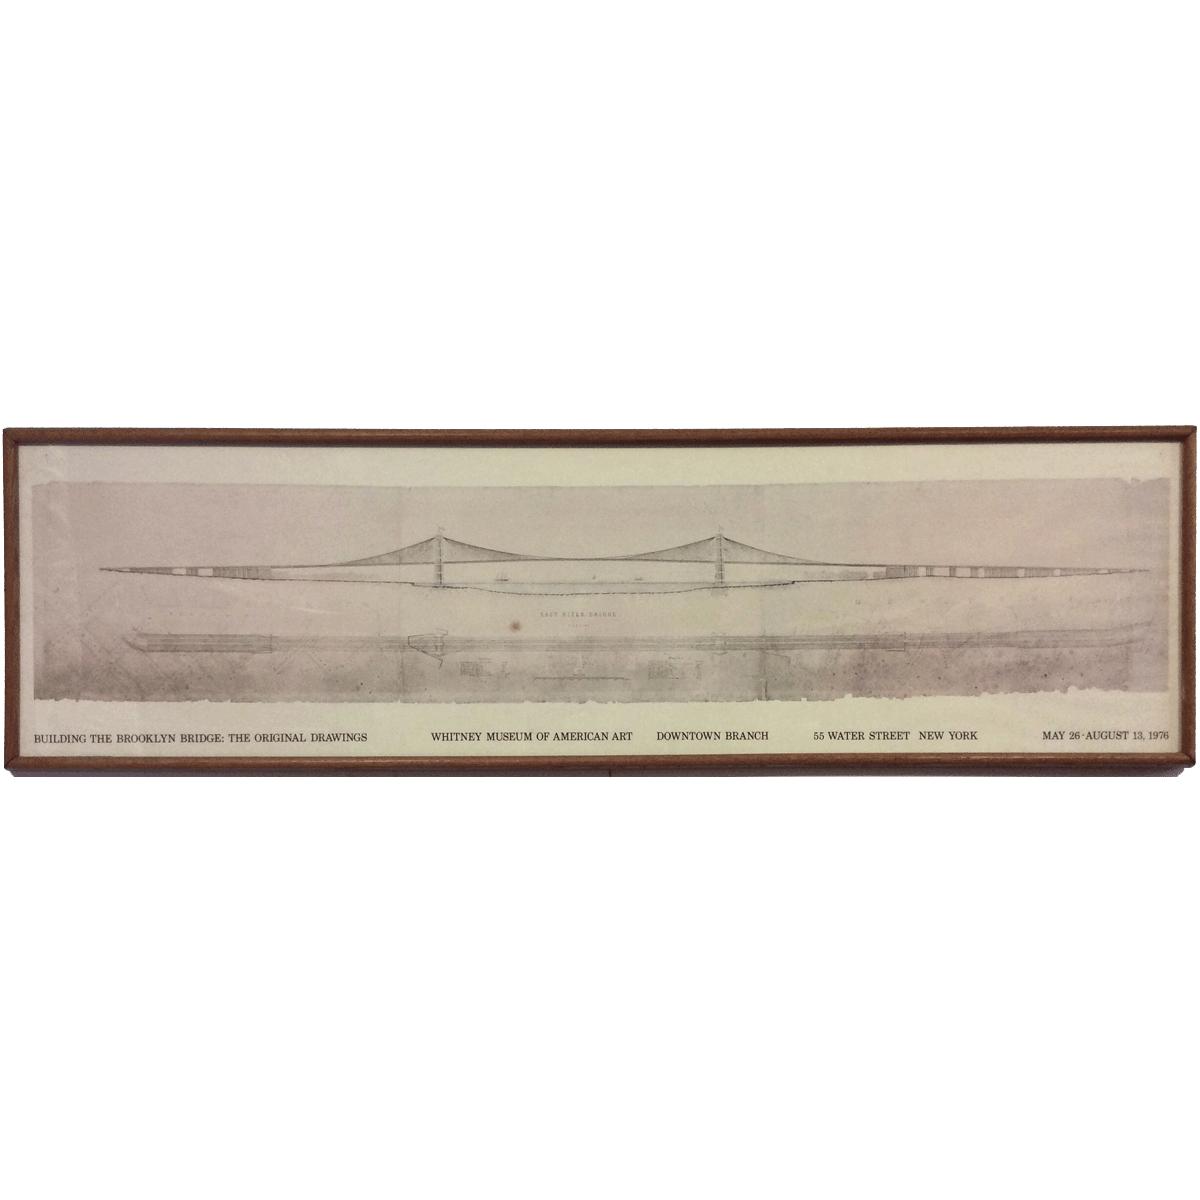 Building the Brooklyn Bridge: The Original Drawings